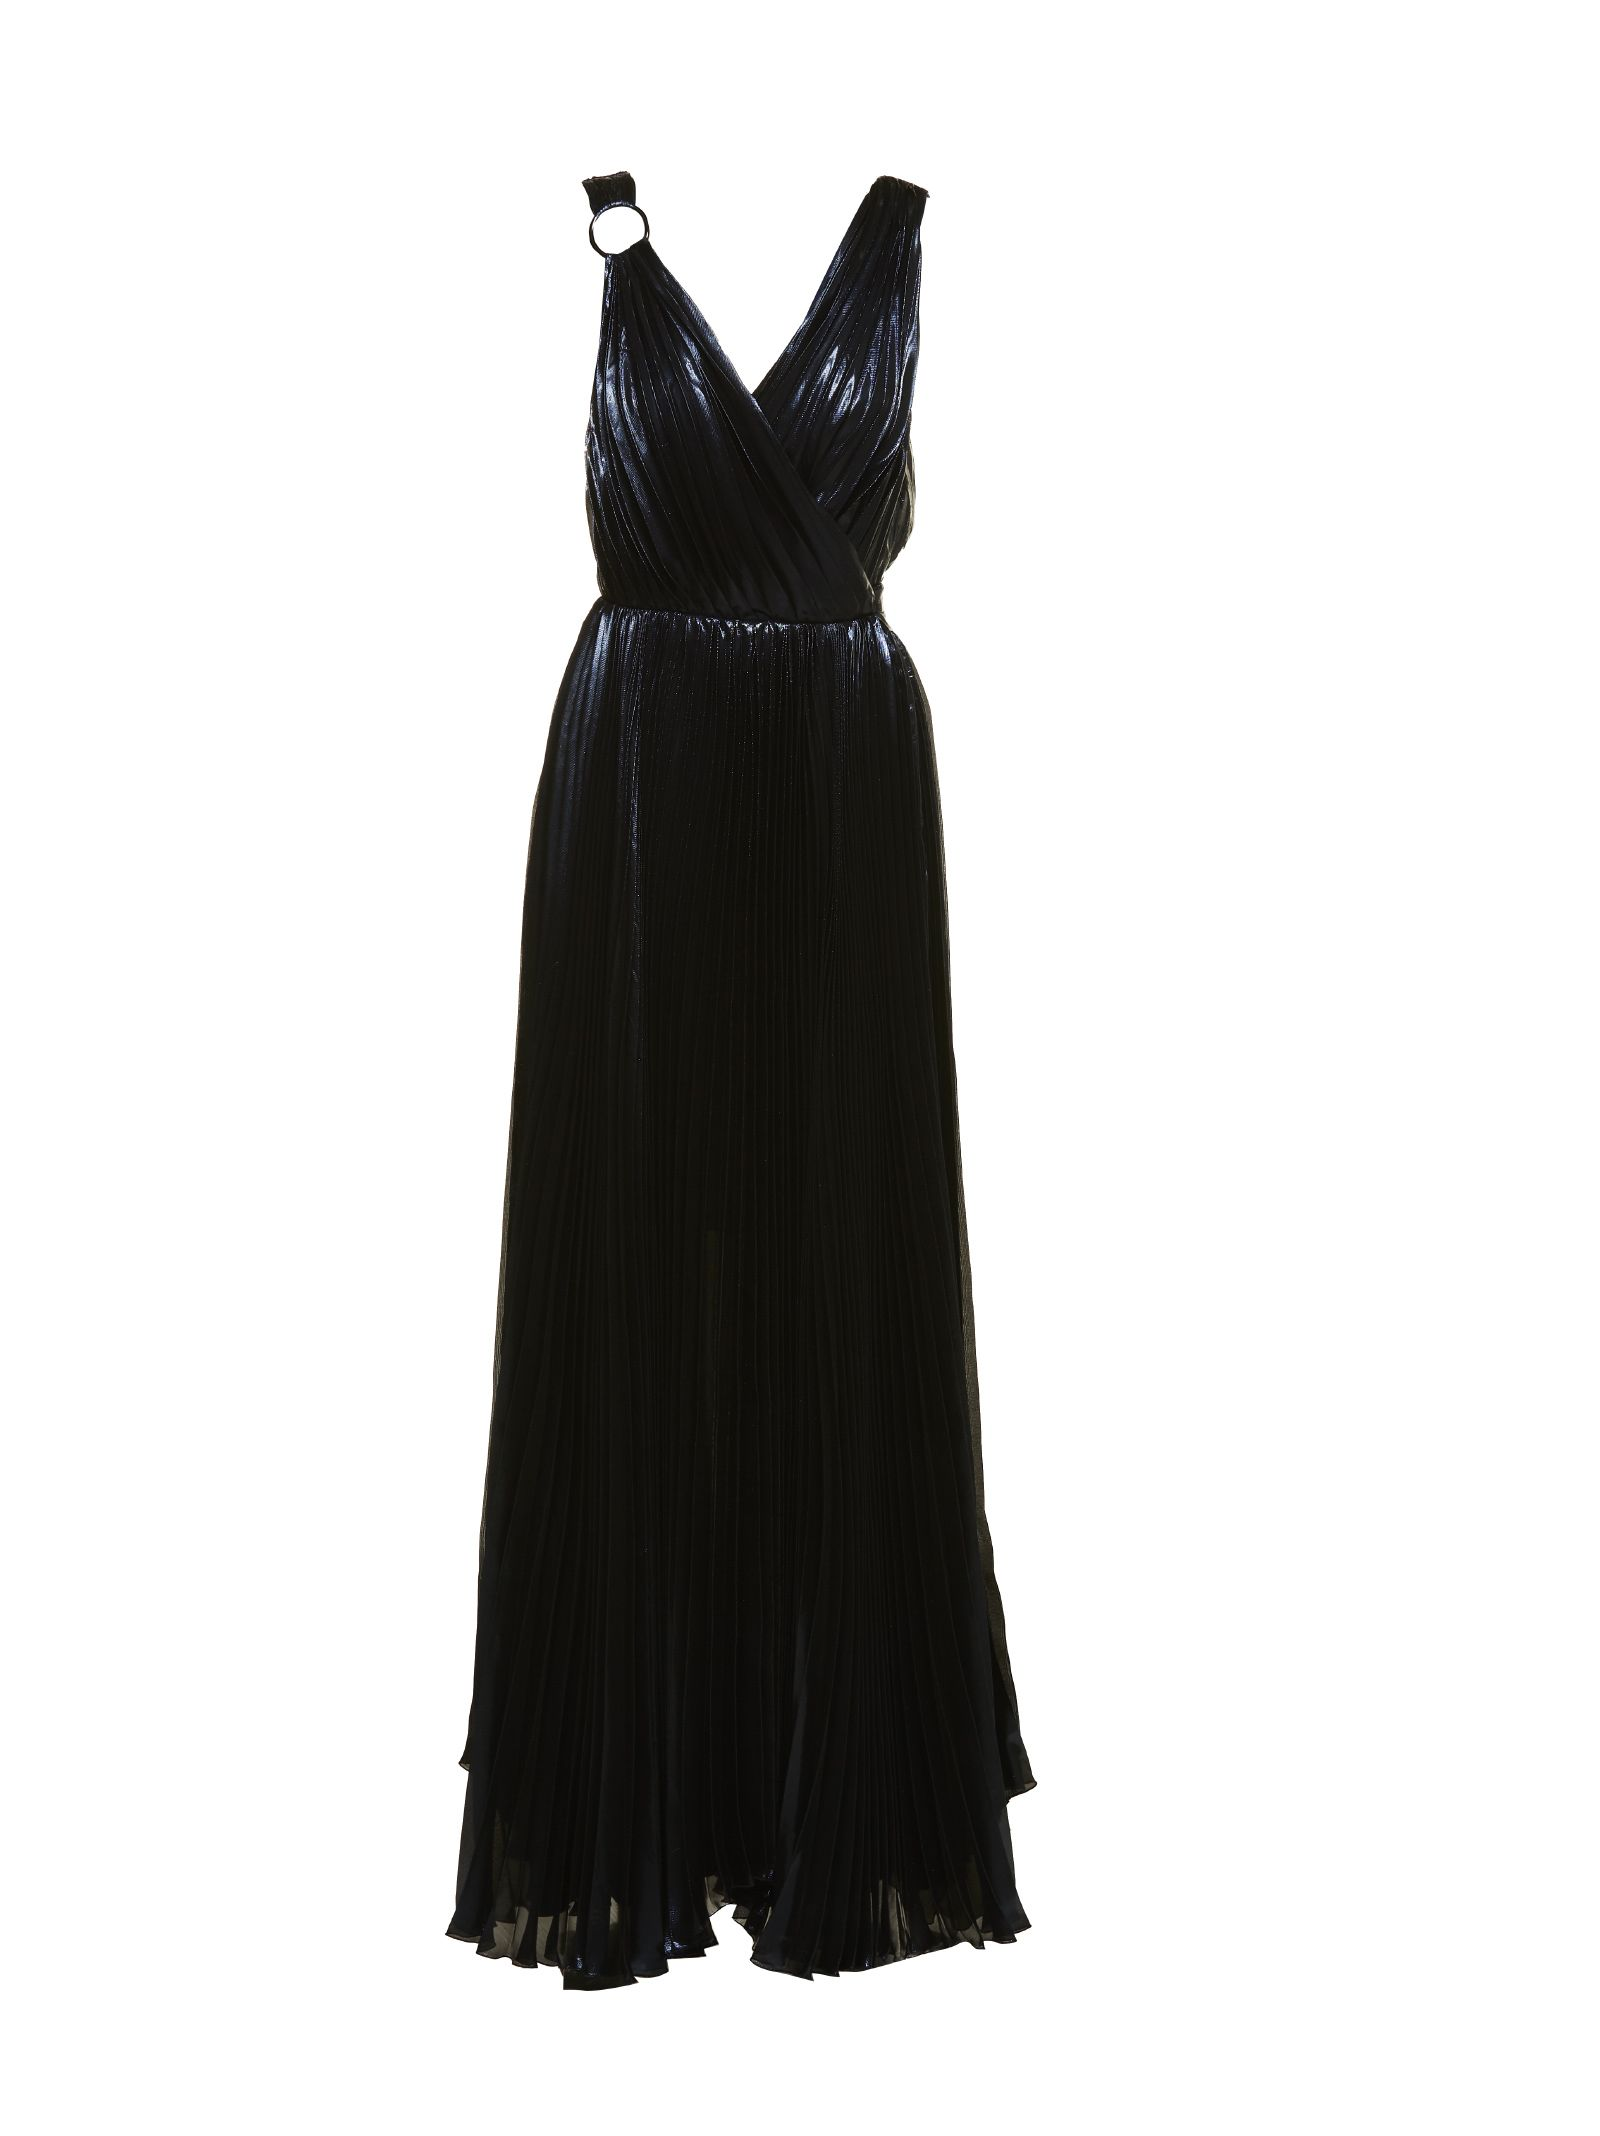 Polka Dots Pleated Long Dress in Black